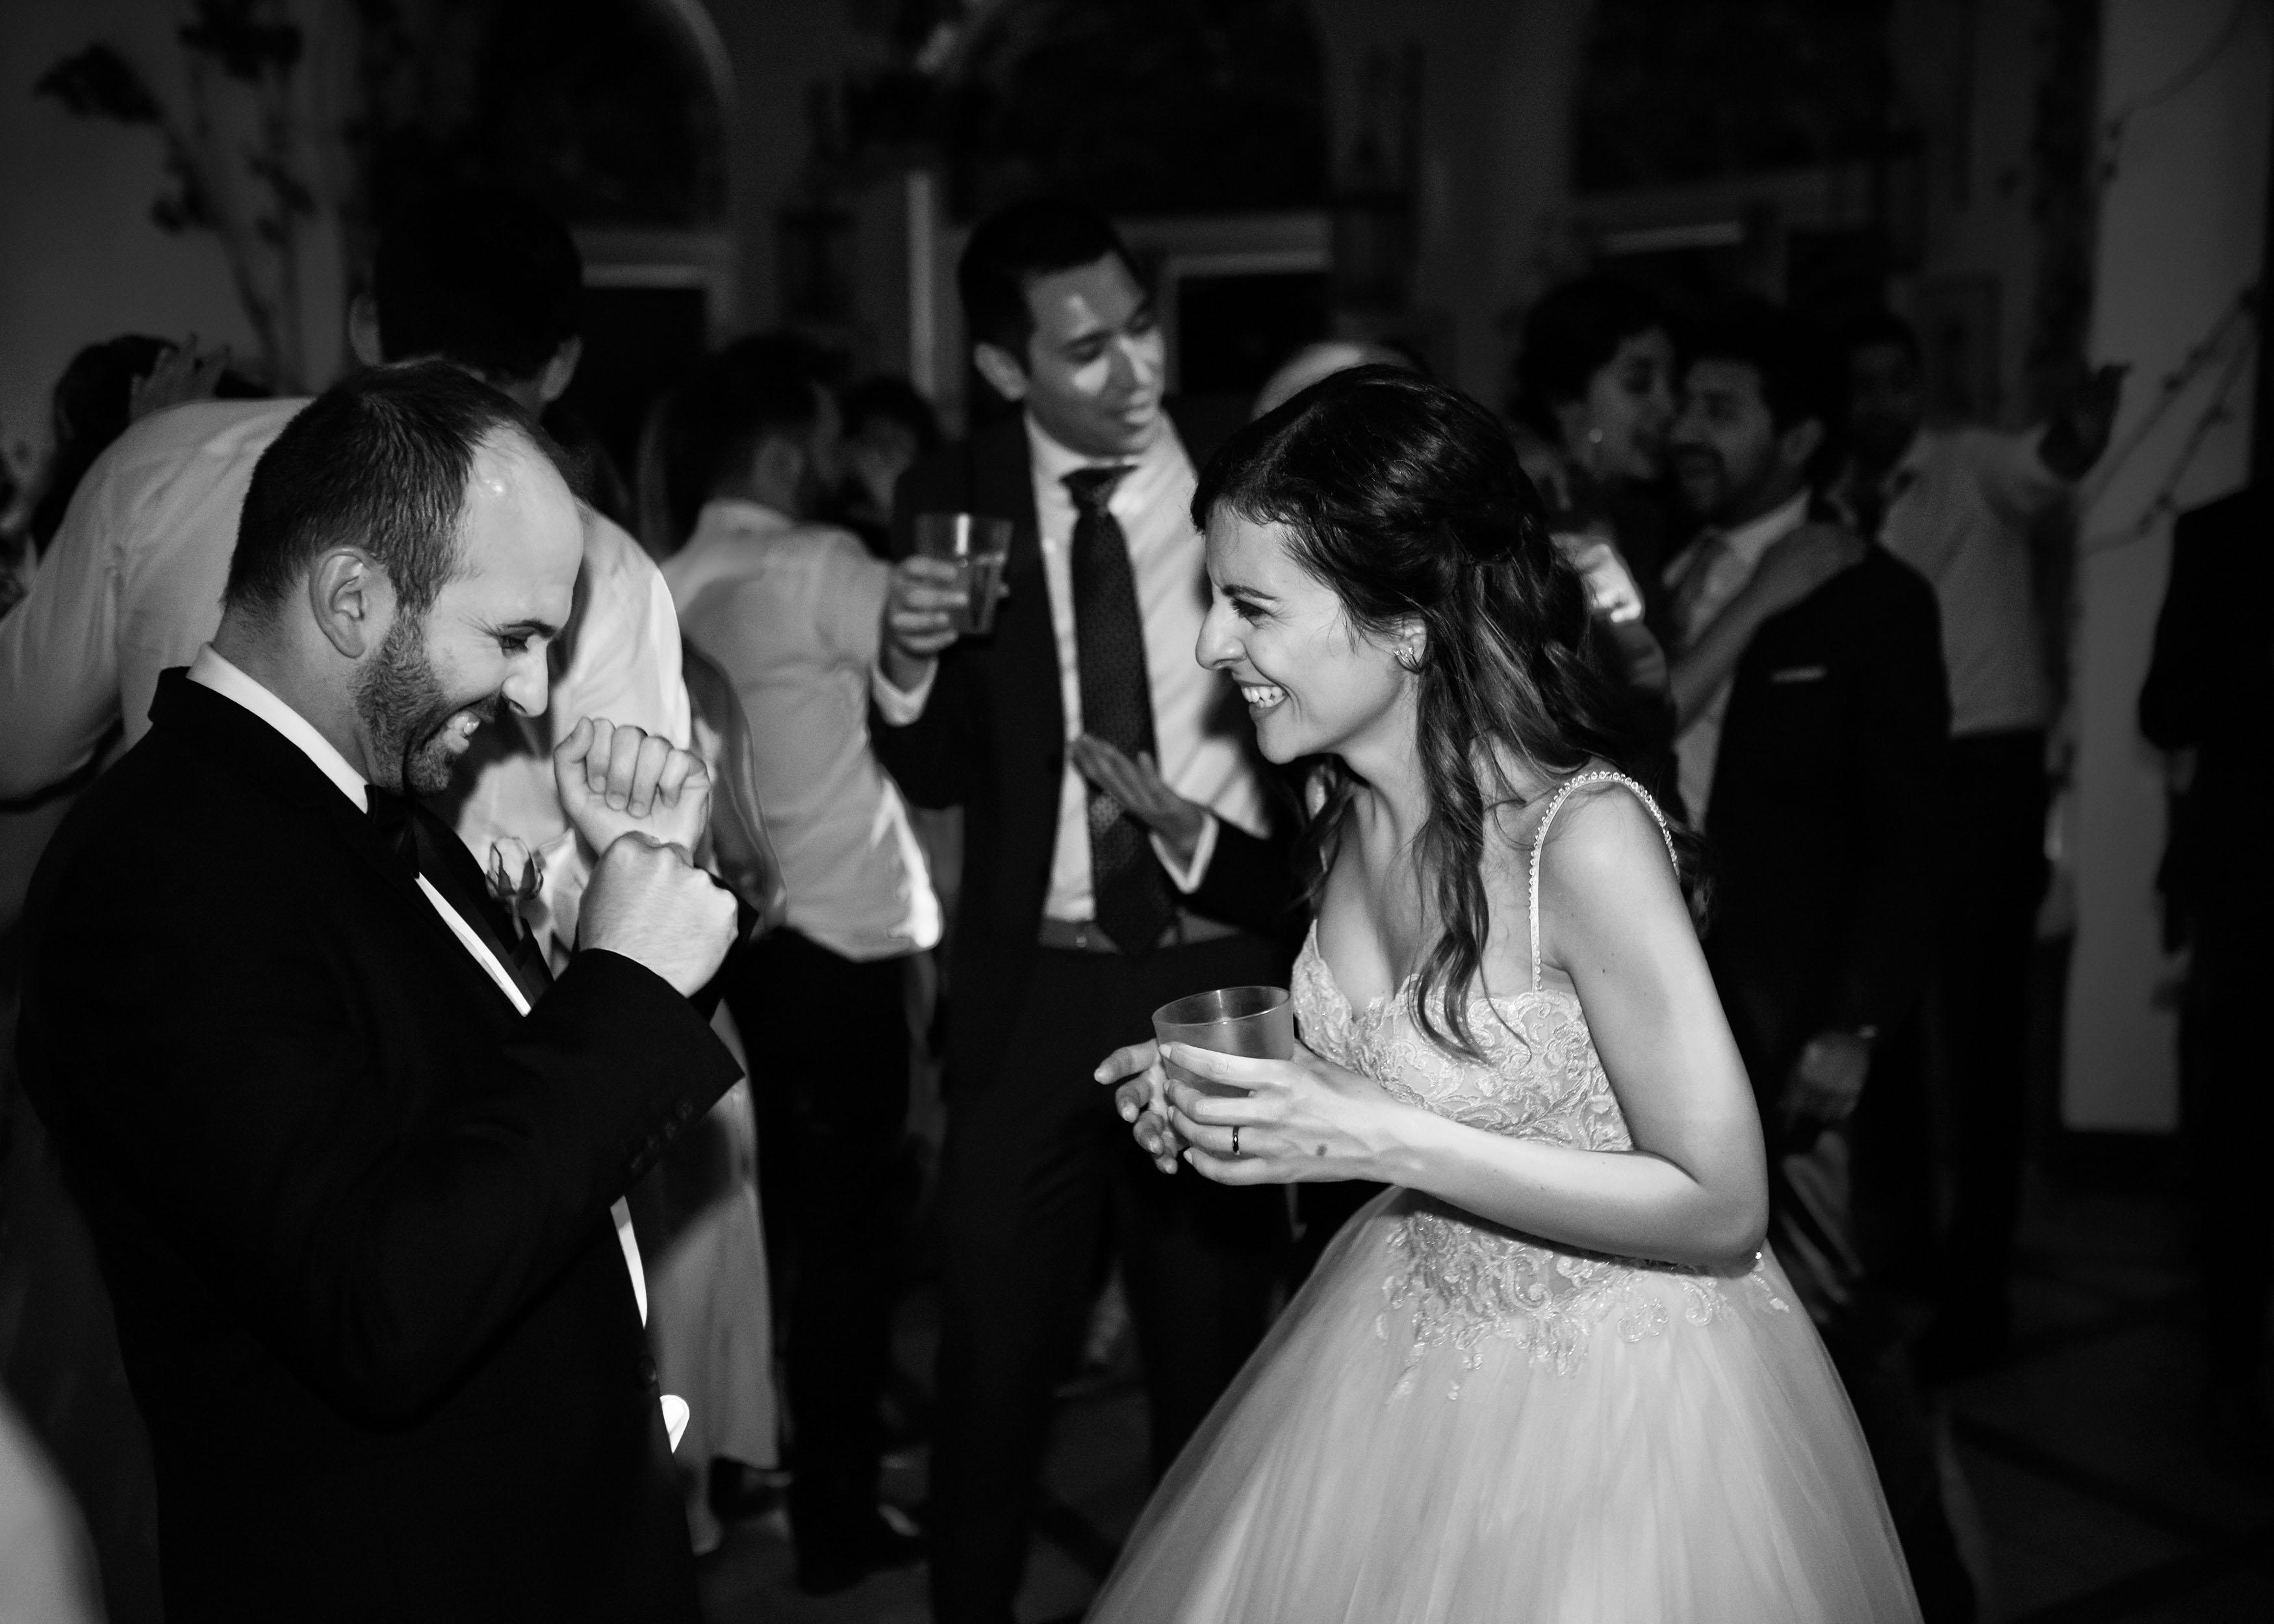 http://www.weddingamalfi.com/wp-content/uploads/Katia-Jorge-18-maggio-2019-47.jpg